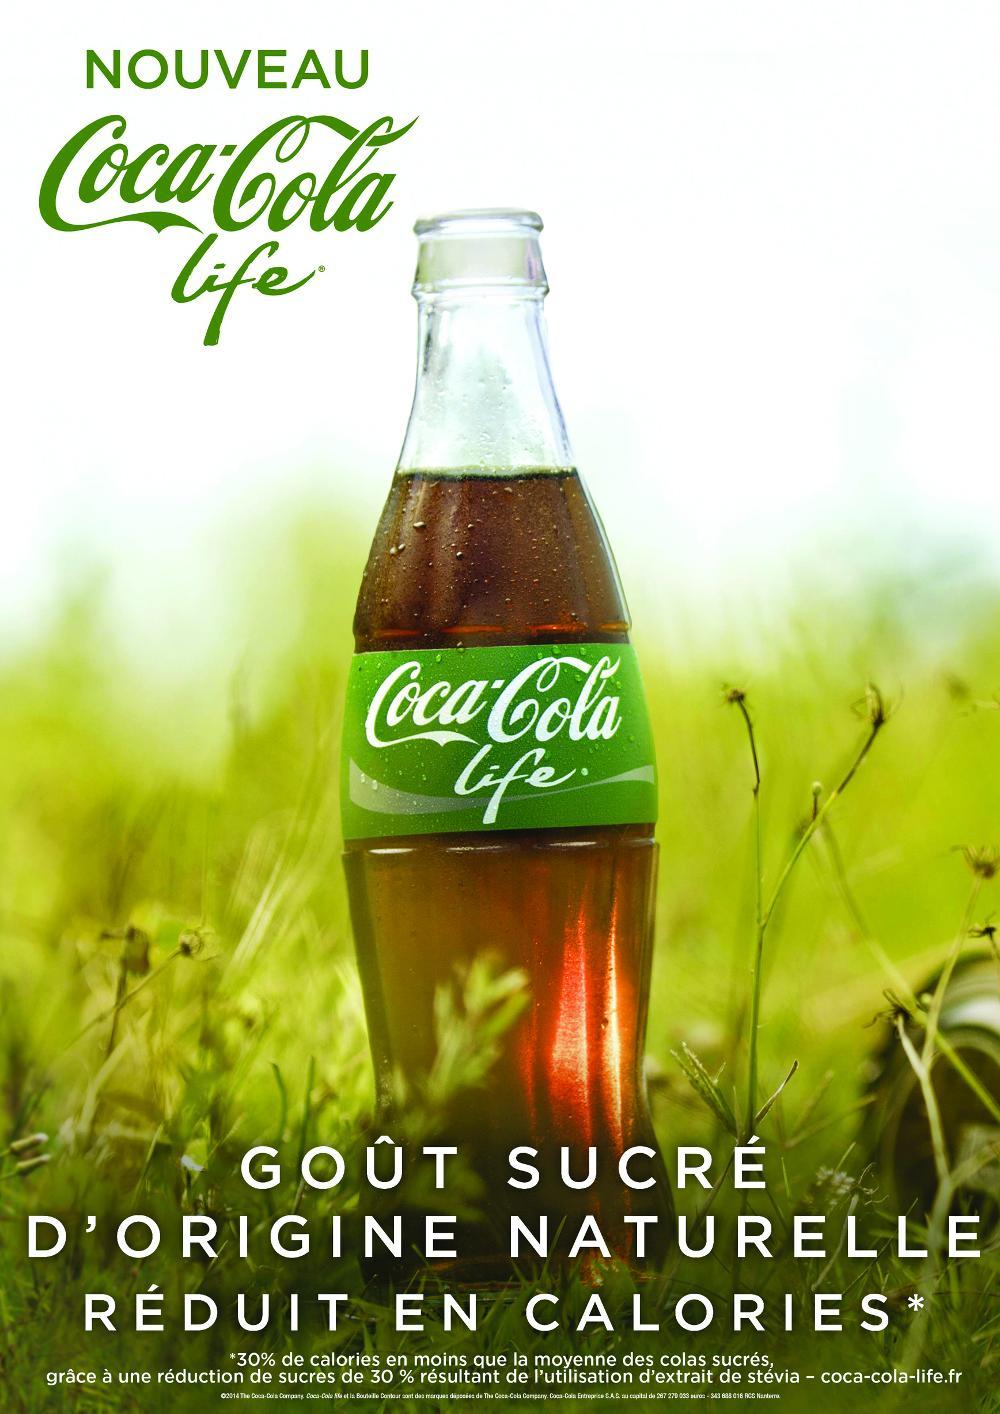 Cinq Questions Sur Coca Cola Life Boissons Et Liquides